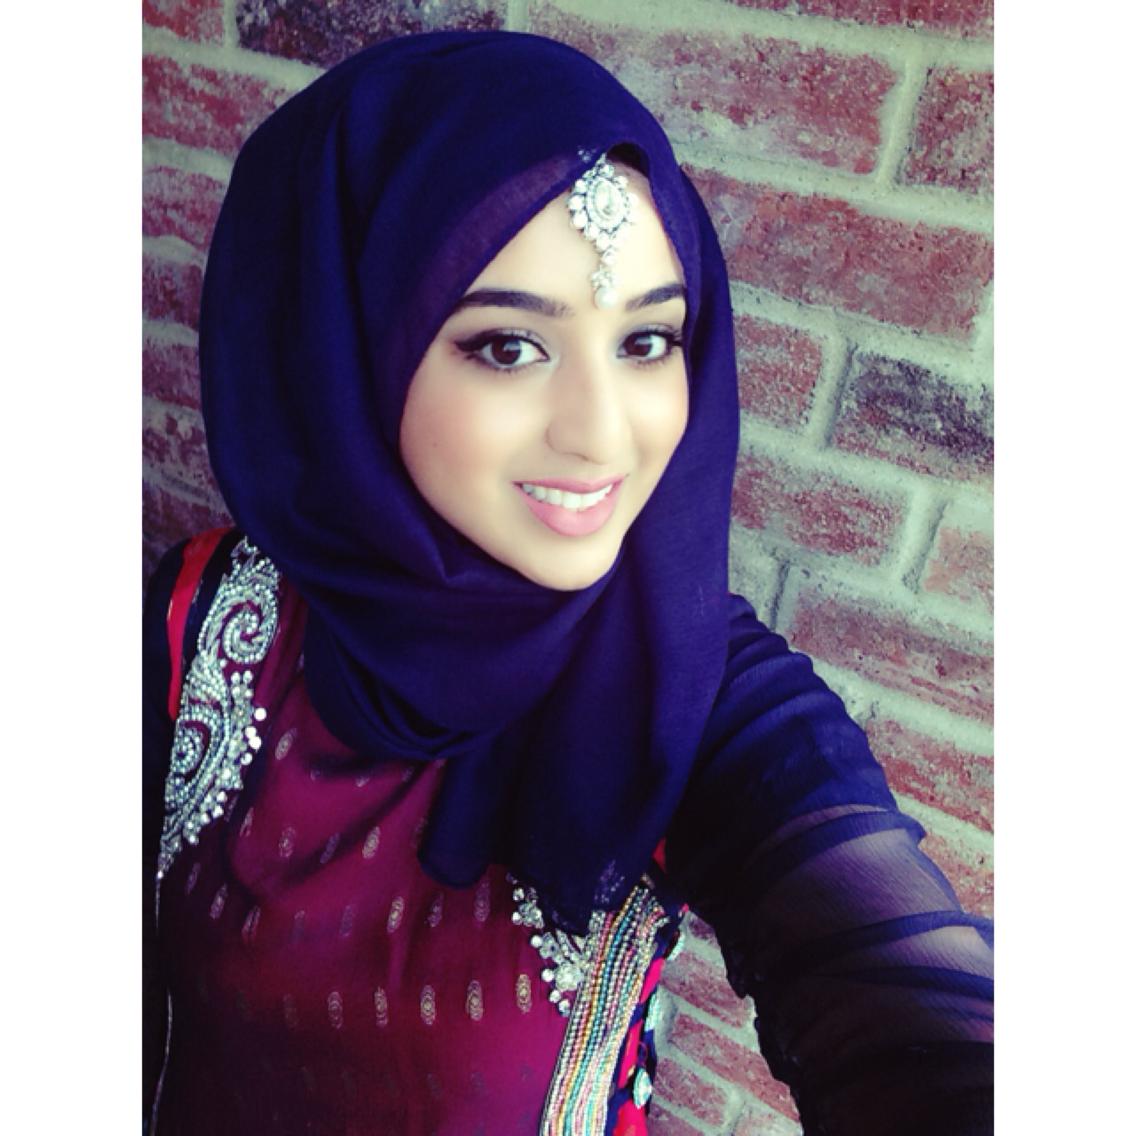 Safoorasheed Hijabi Fashion Pakistani Outfit Desi Wedding Segiempat Shabby Chic Sj0004 Maang Tikkah Blue Hijab Safoorai